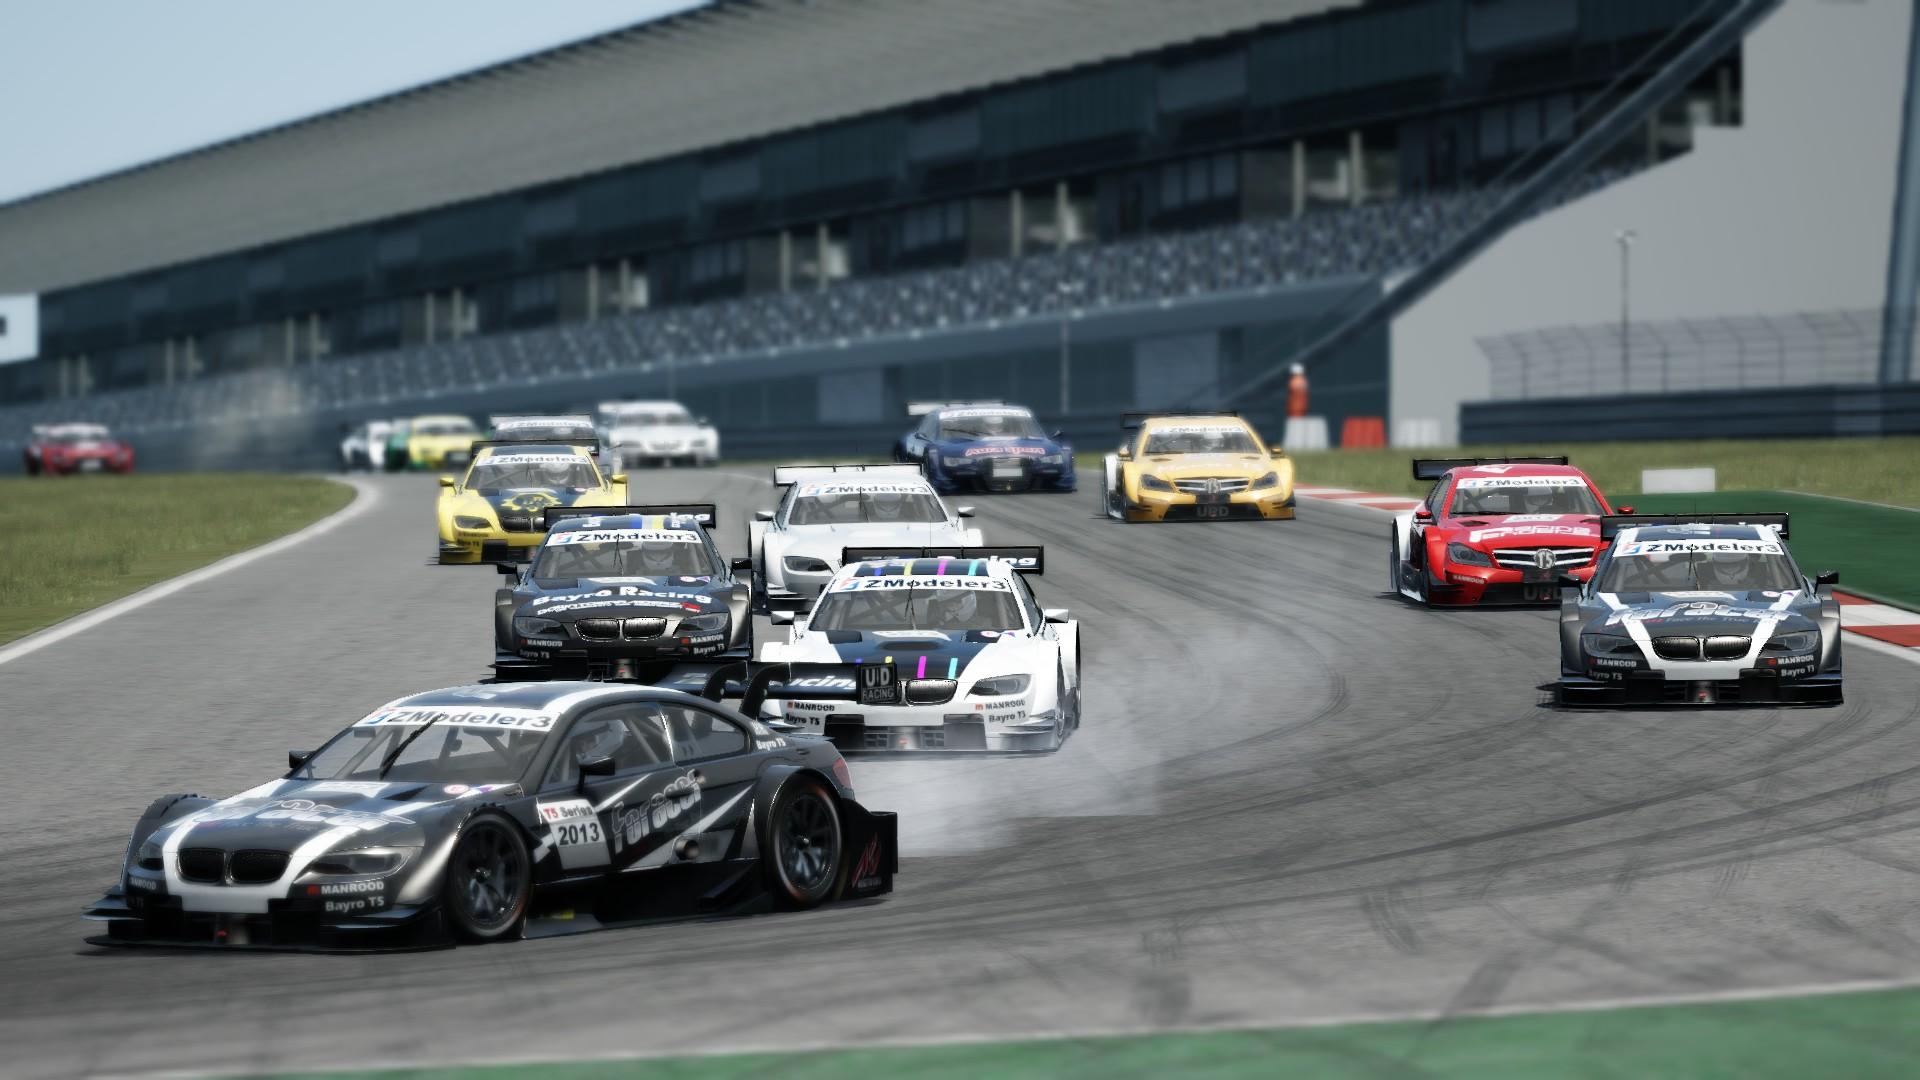 Club Race - T5 @ Nurby Sprint